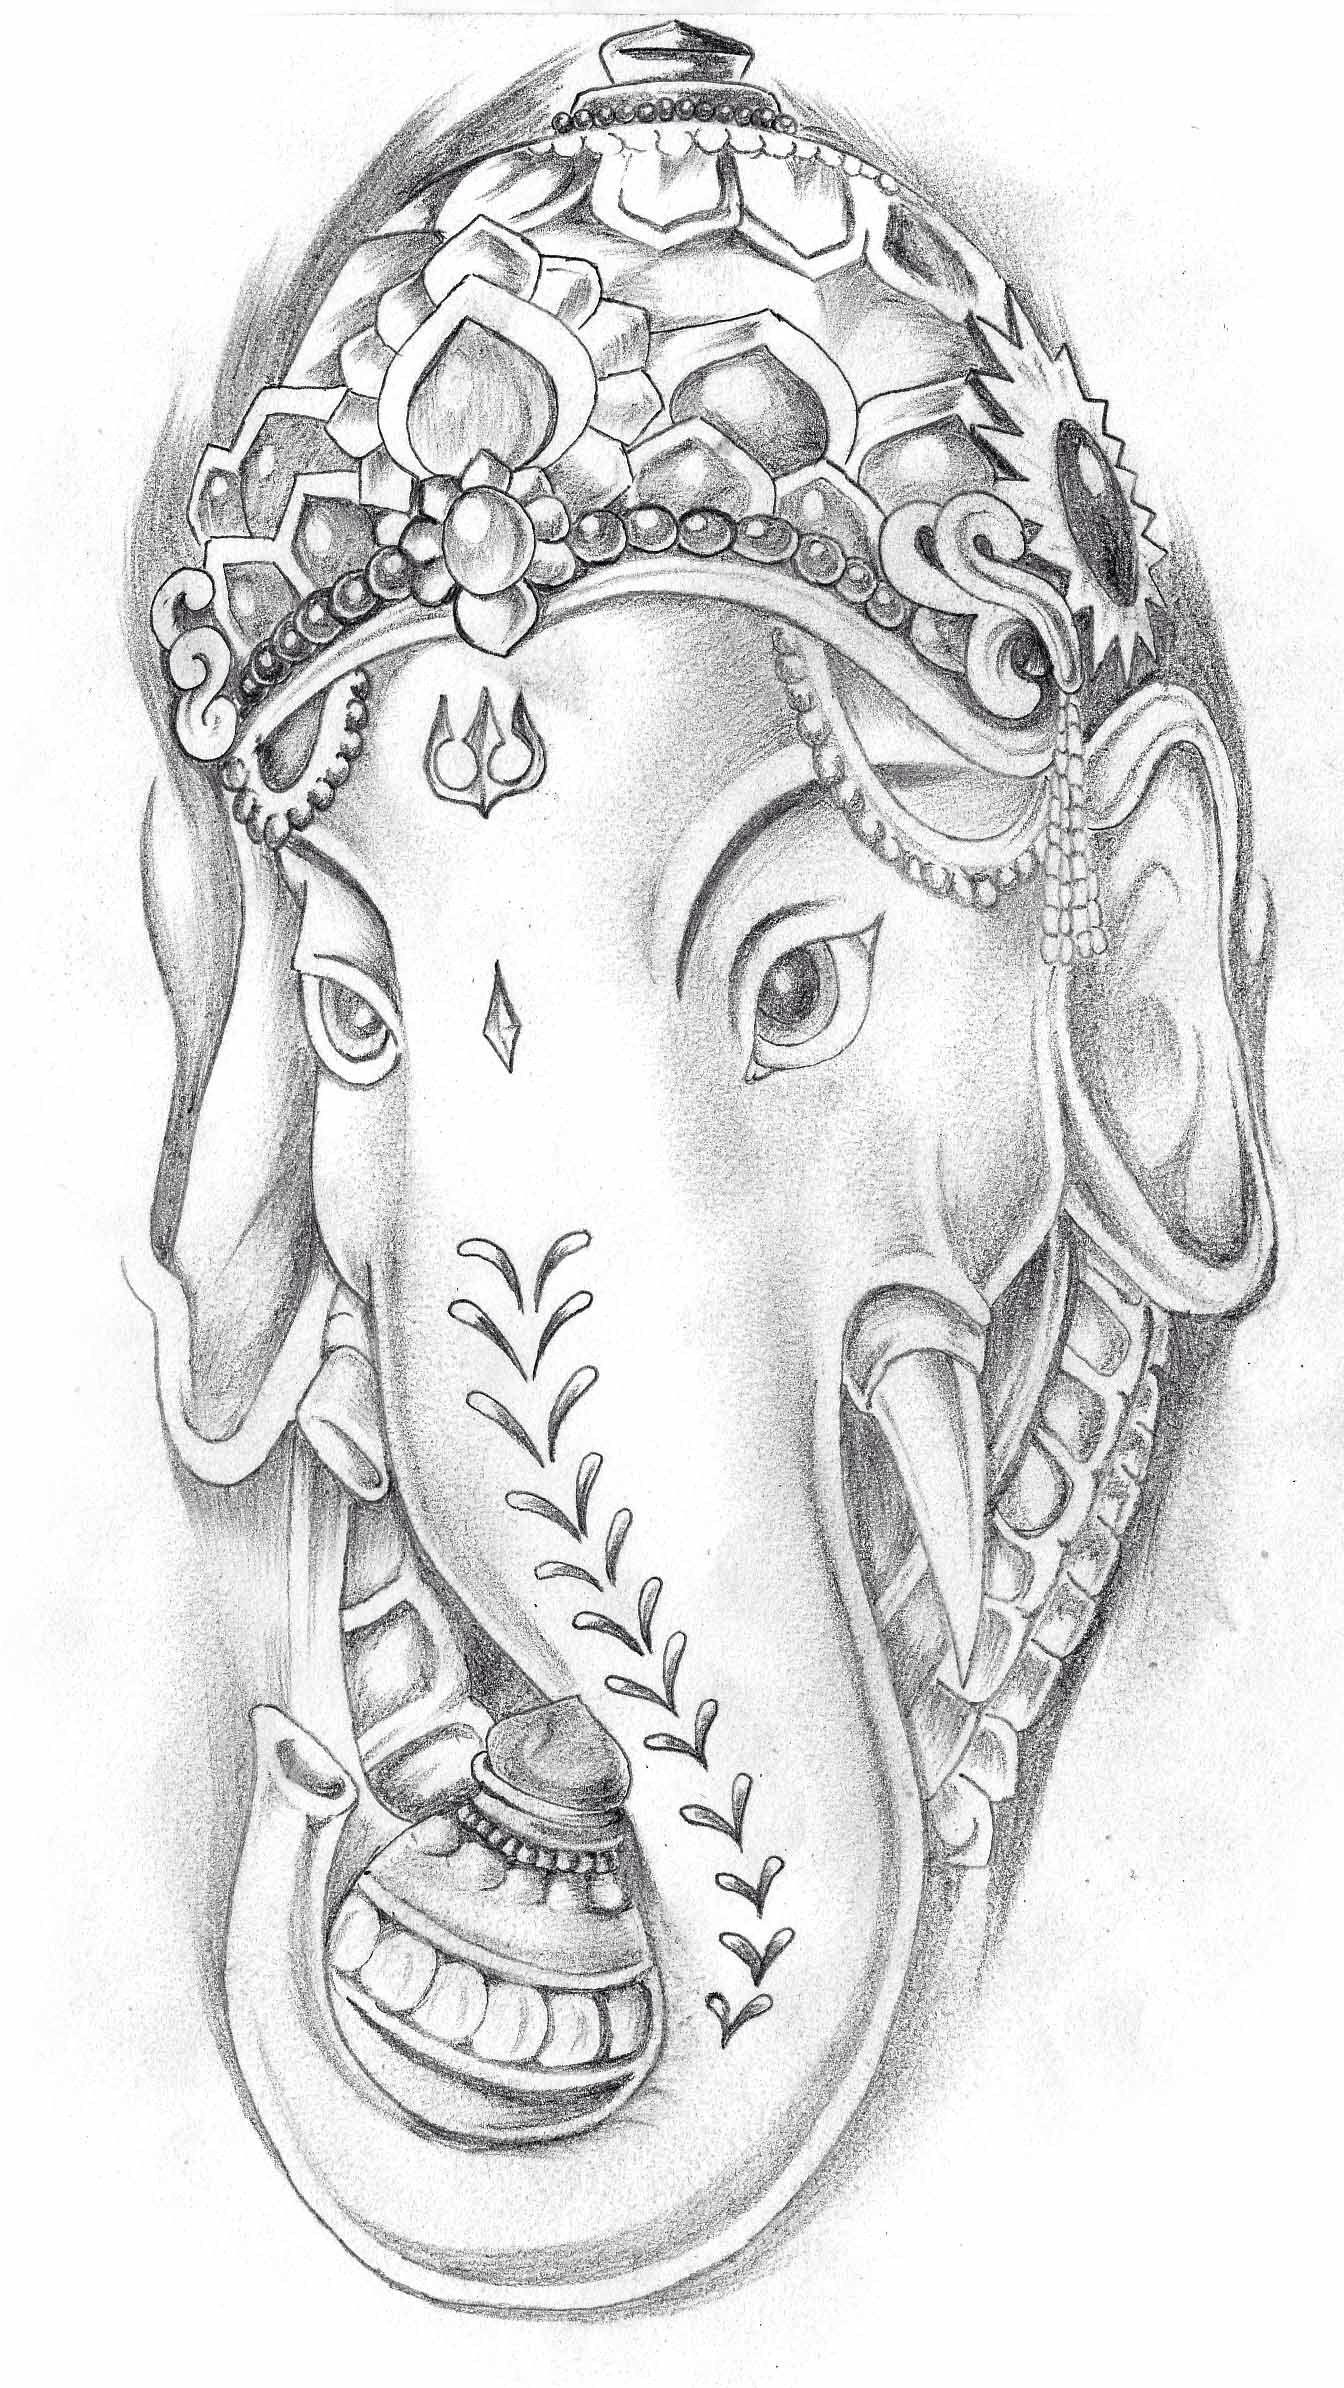 Ganesh Ganesha Tattoo Ganesh Tattoo Elephant Tattoos